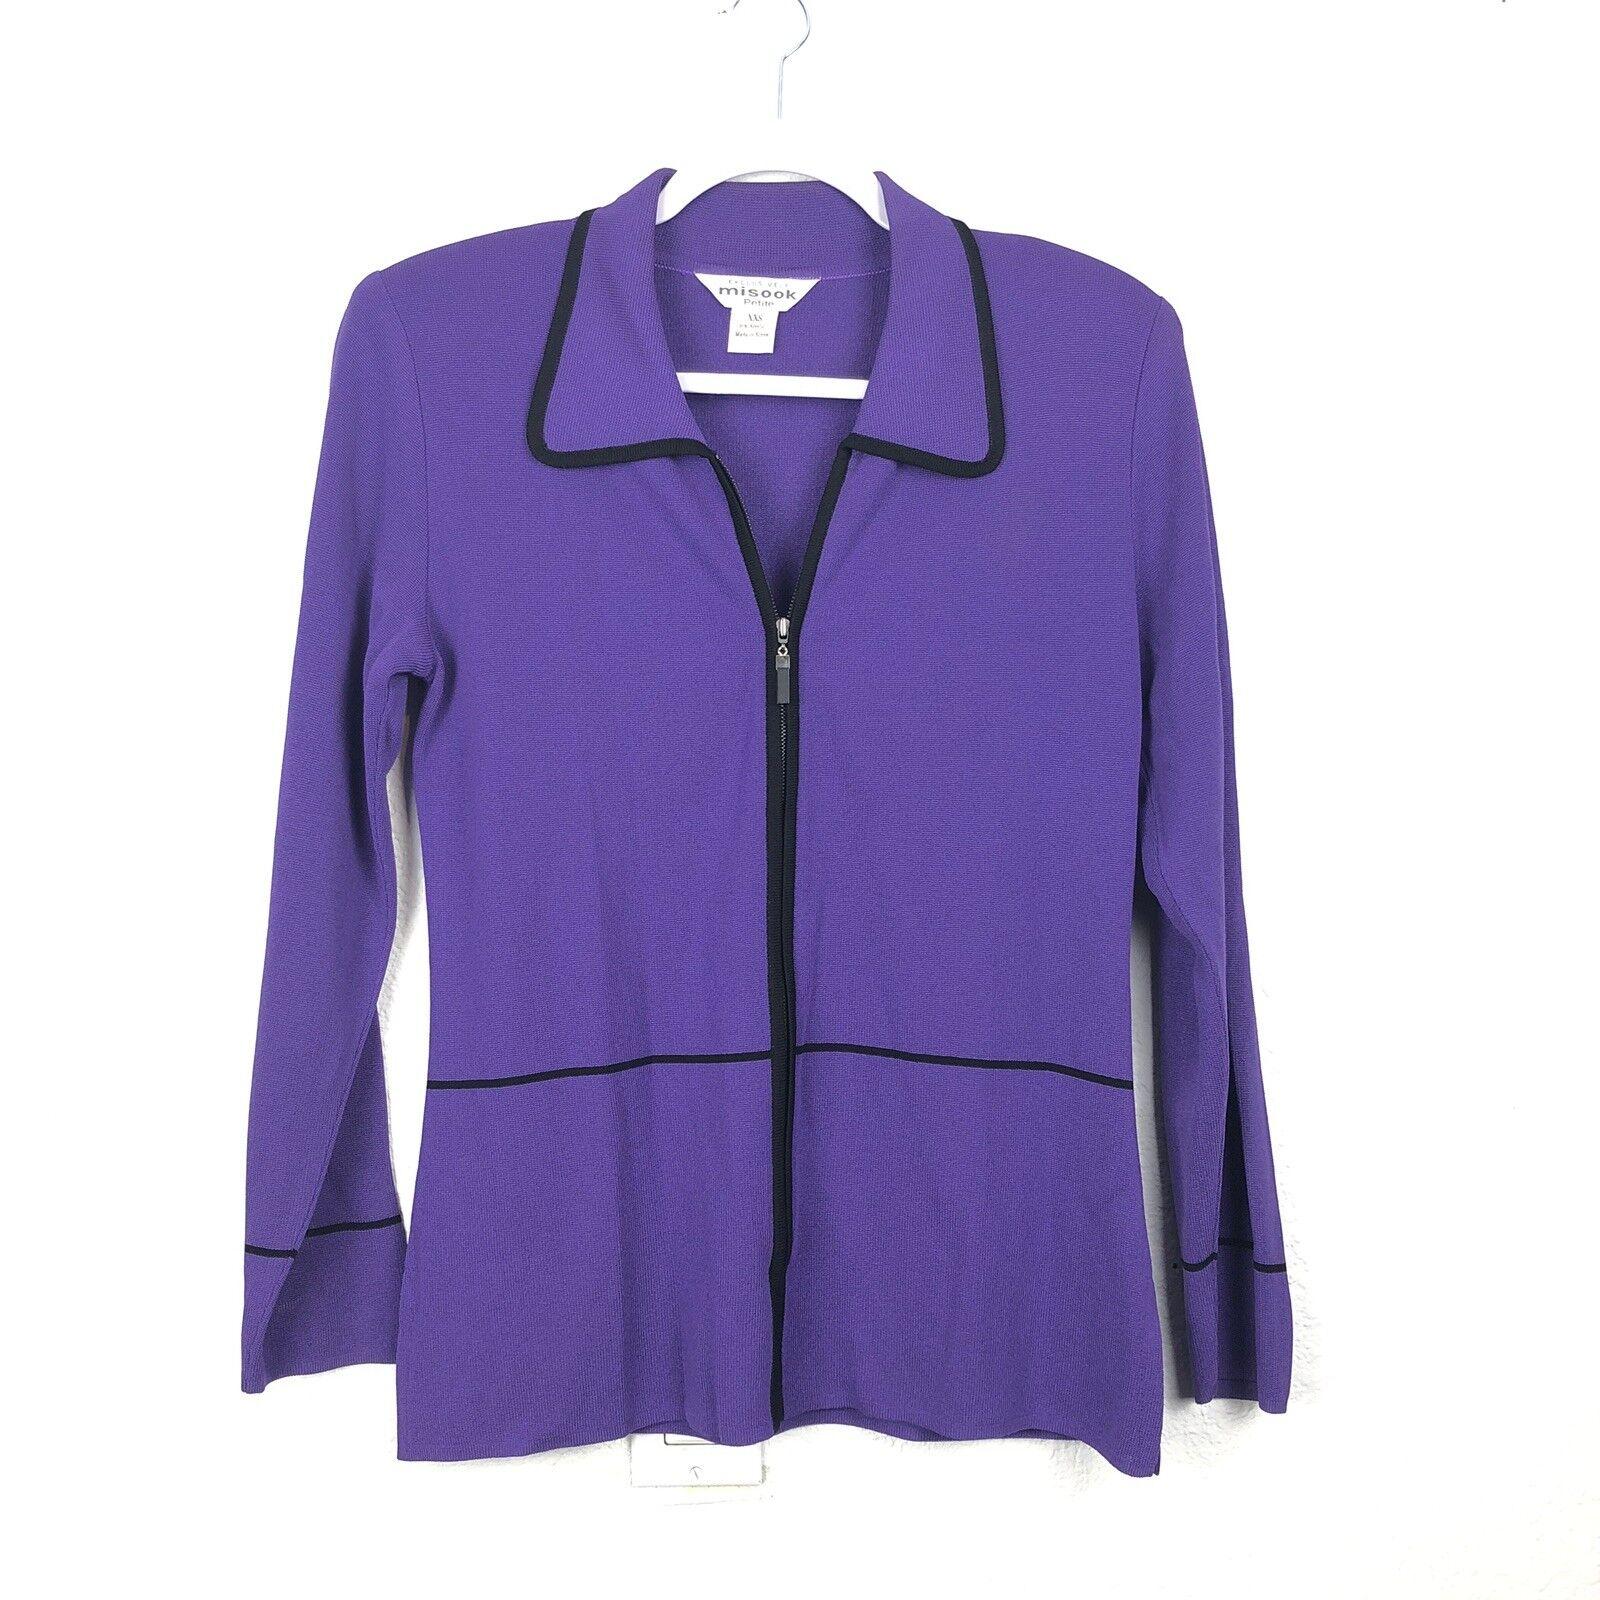 Exclusively Misook Petite damen blouse Größe Xxs lila Zip Up Cardigan (BSKT)